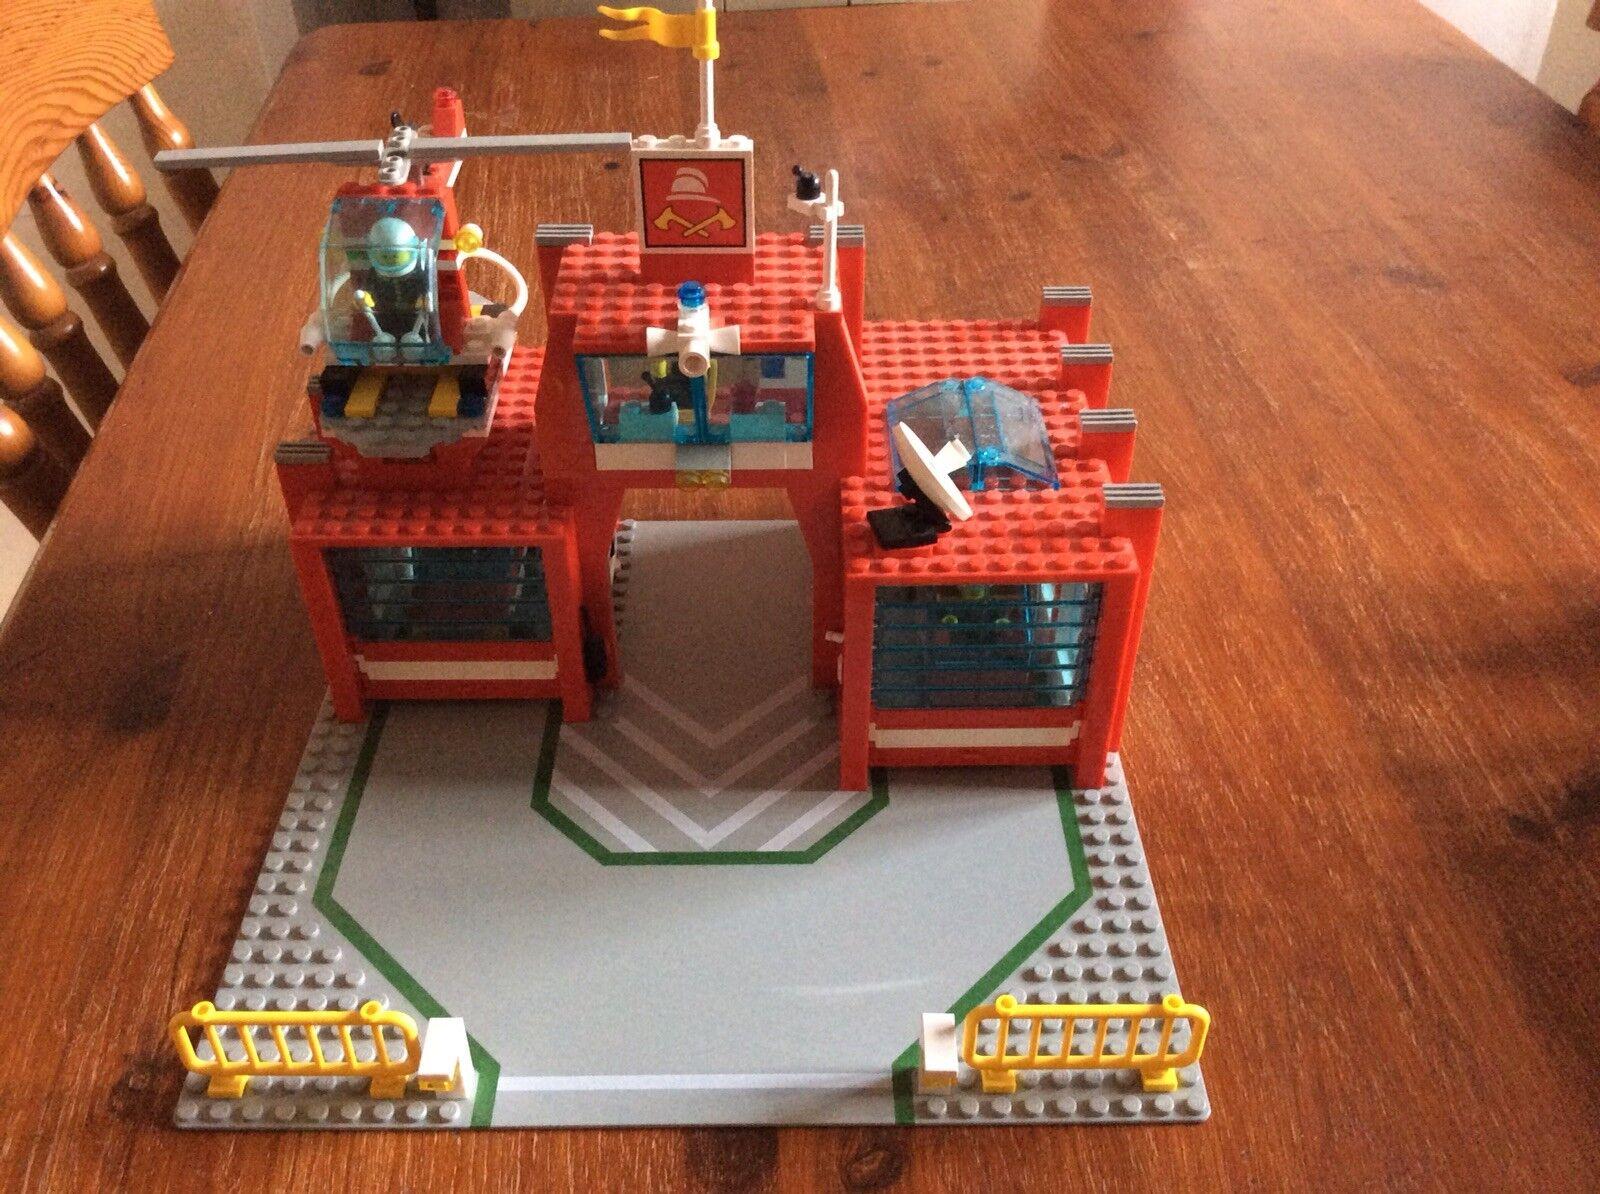 Lego Vintage 6389 6389 6389 Fire Control Centre (1990) acdcc6